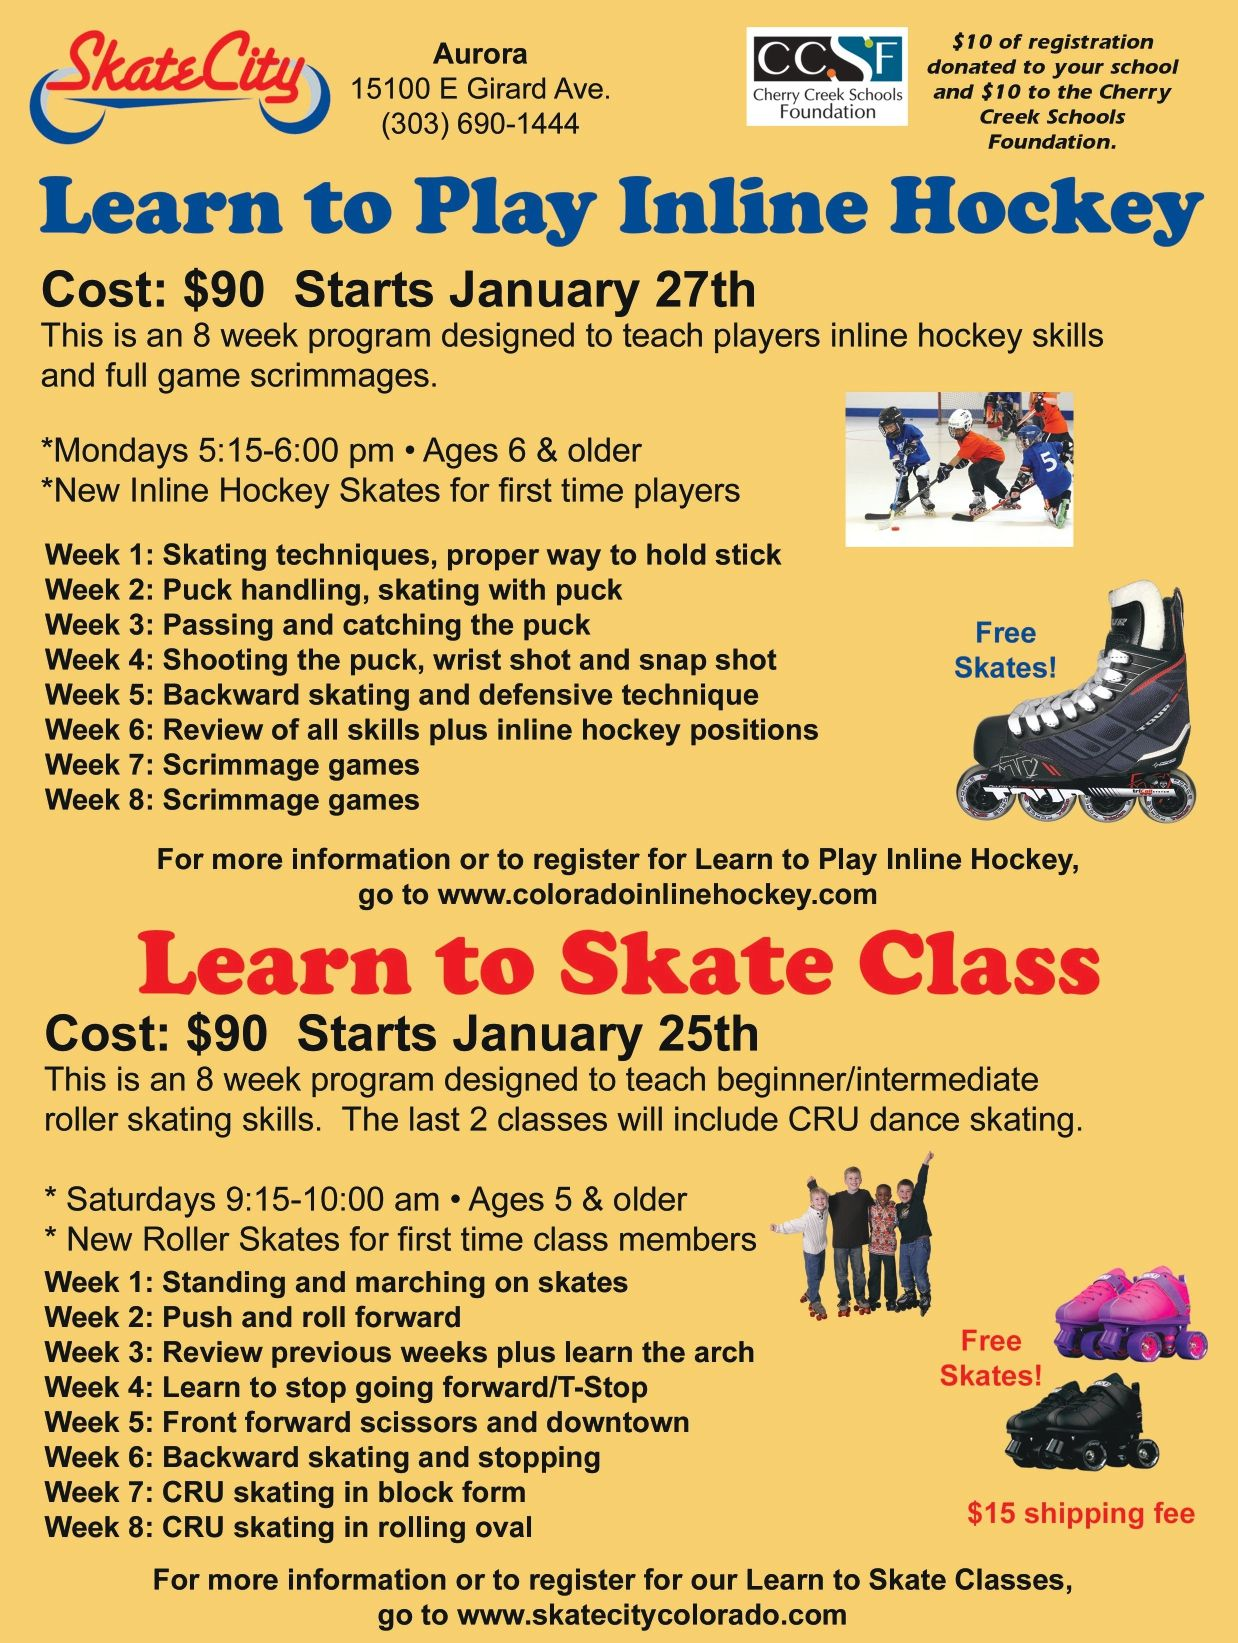 Skate City Inline Hockey and Skating Classes